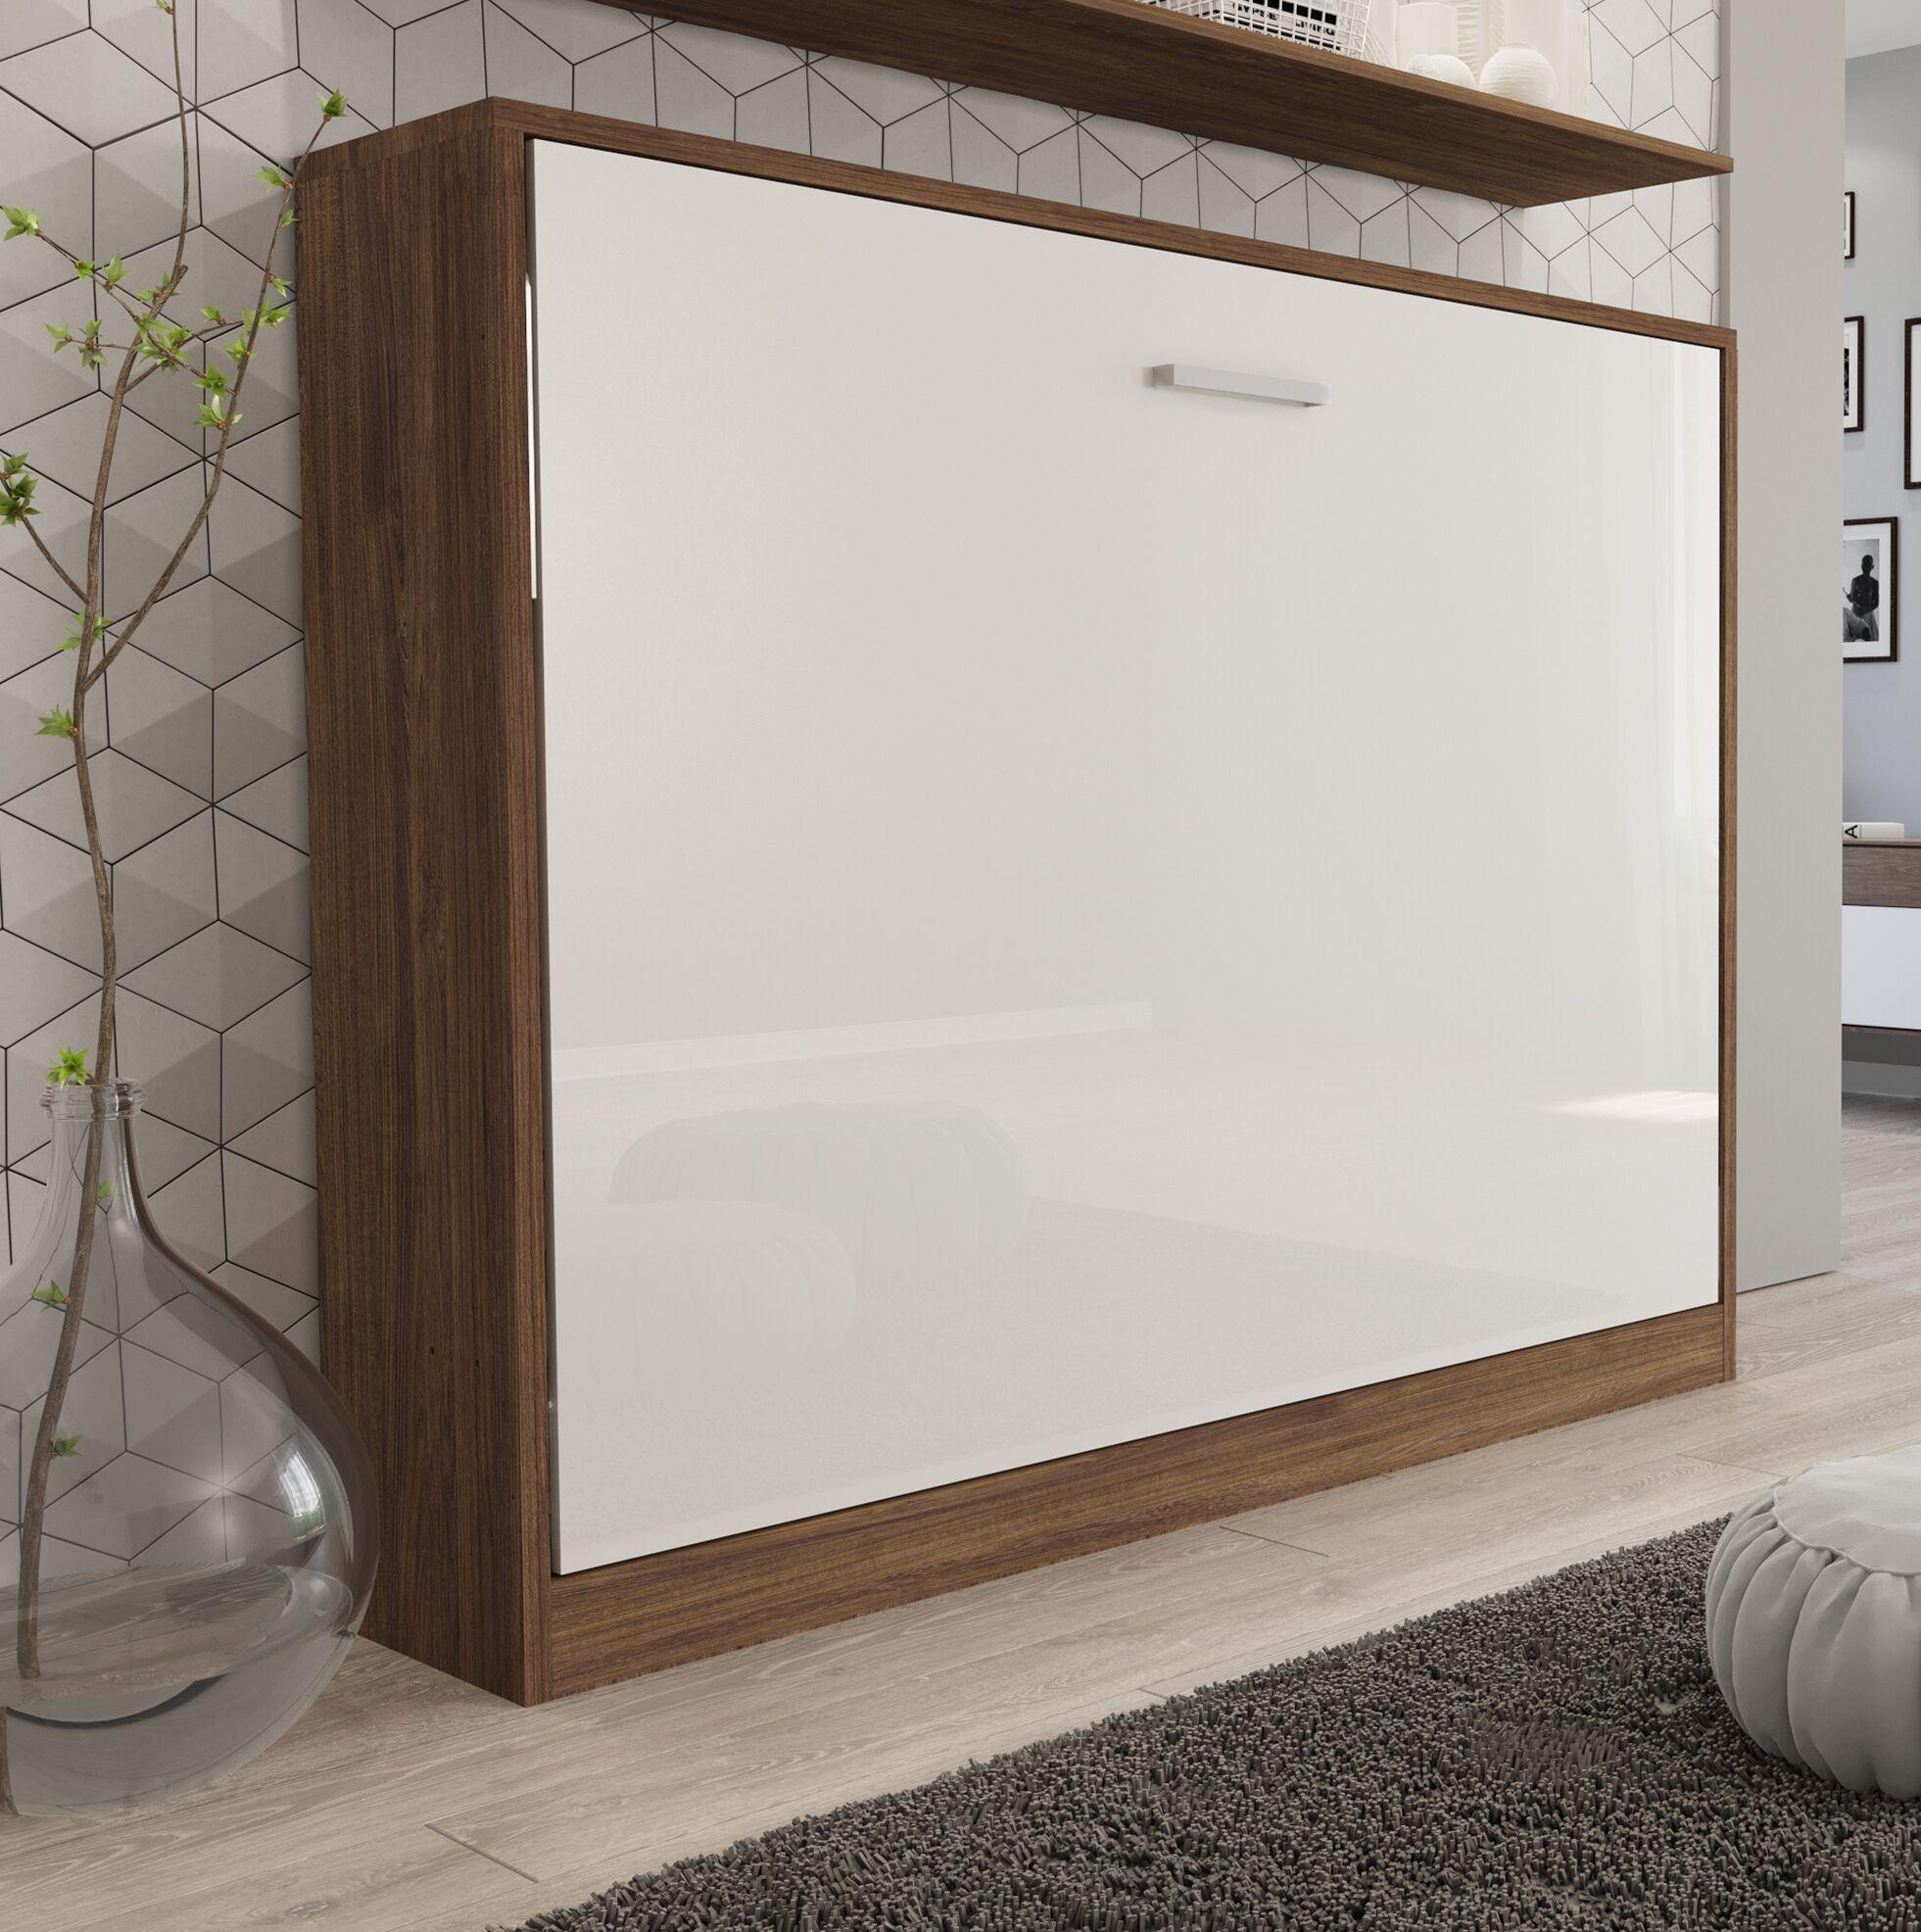 Gautreau Full Murphy Bed with Mattress Color: High-Gloss White/Dark Wood